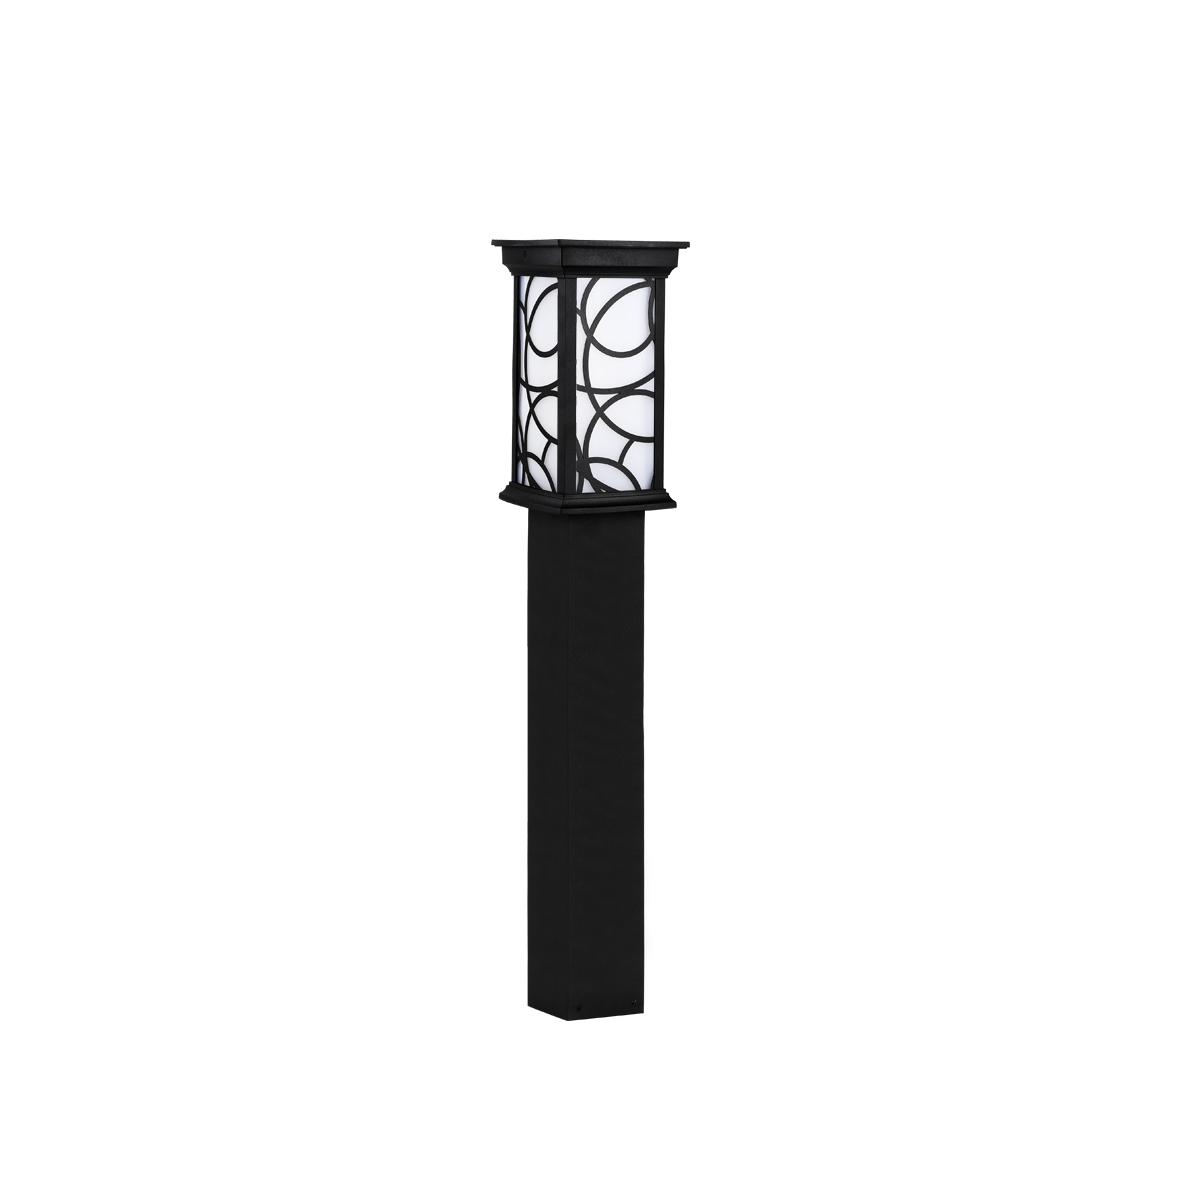 چراغ حیاطی  مدل  SH-1738